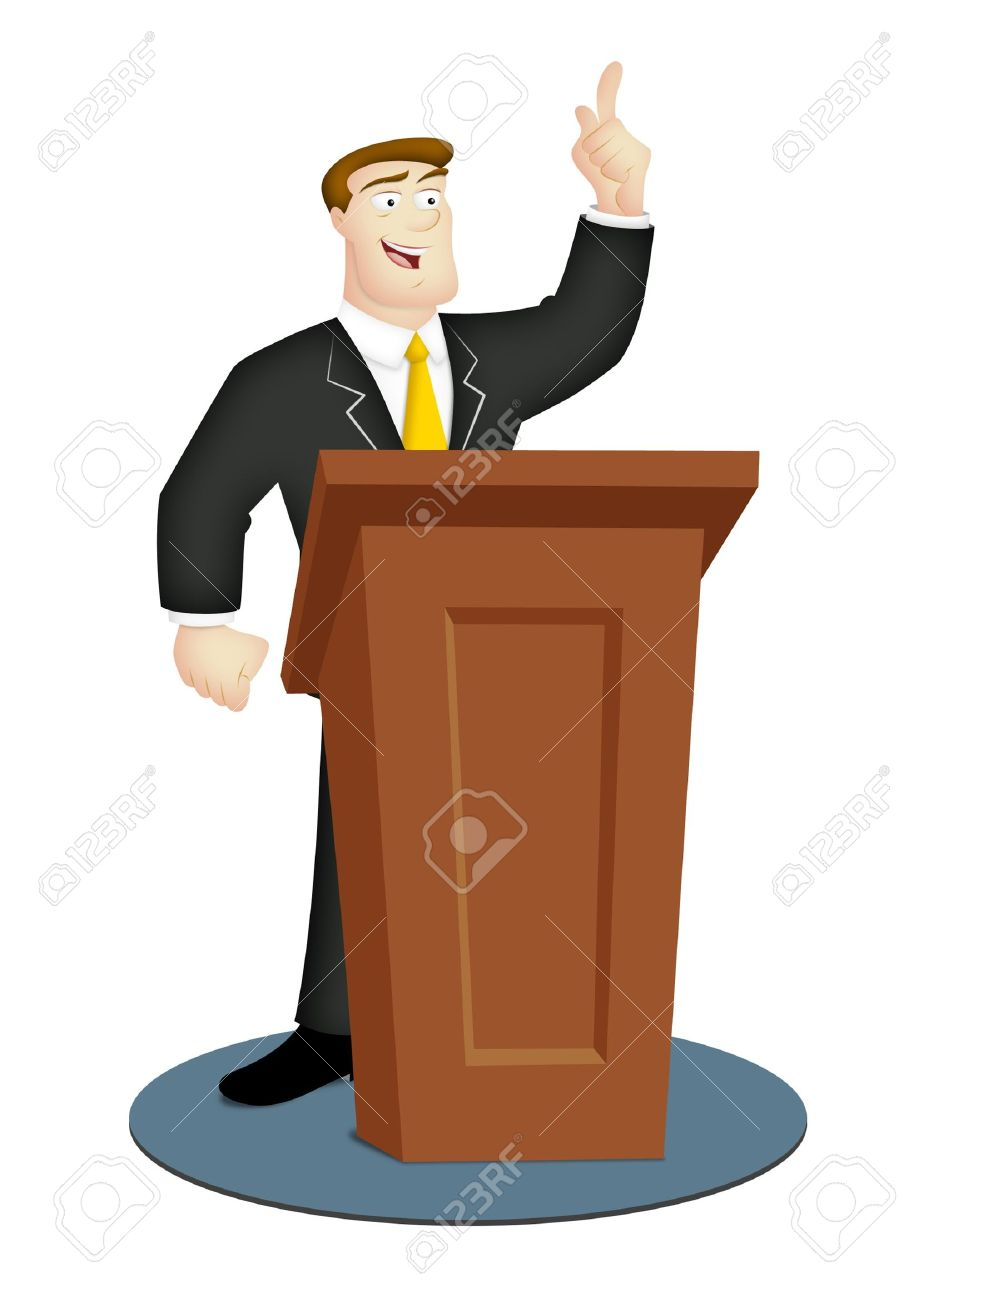 Cartoon speaker in business suit with rostrum. - 9833050